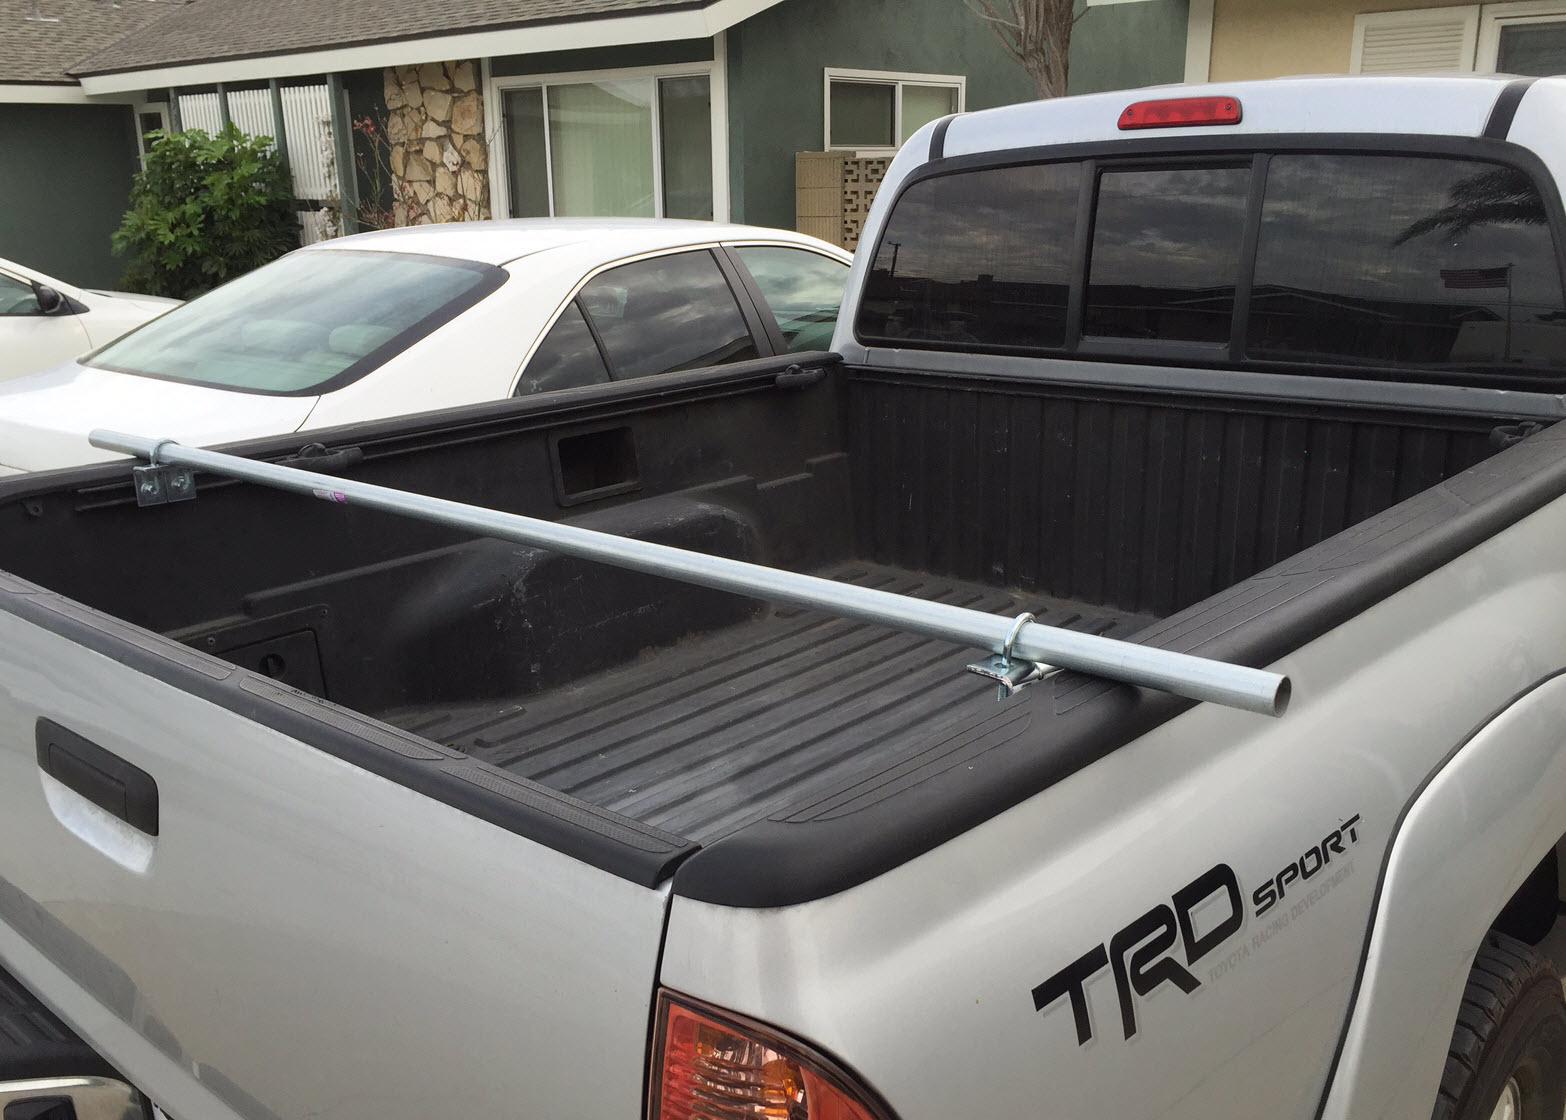 WA6PZB: DIY Tacoma Bed Rack